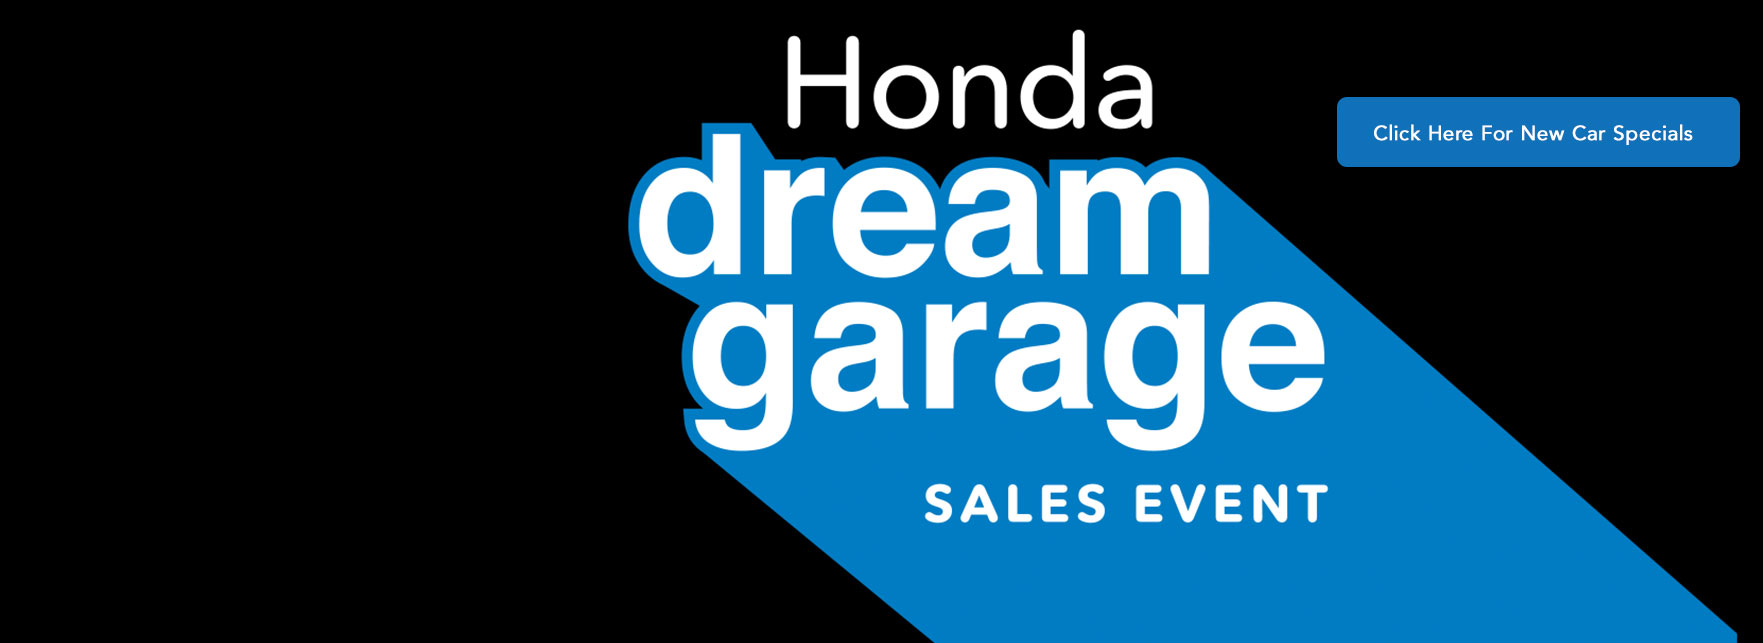 Honda Dream Garage Sales Event